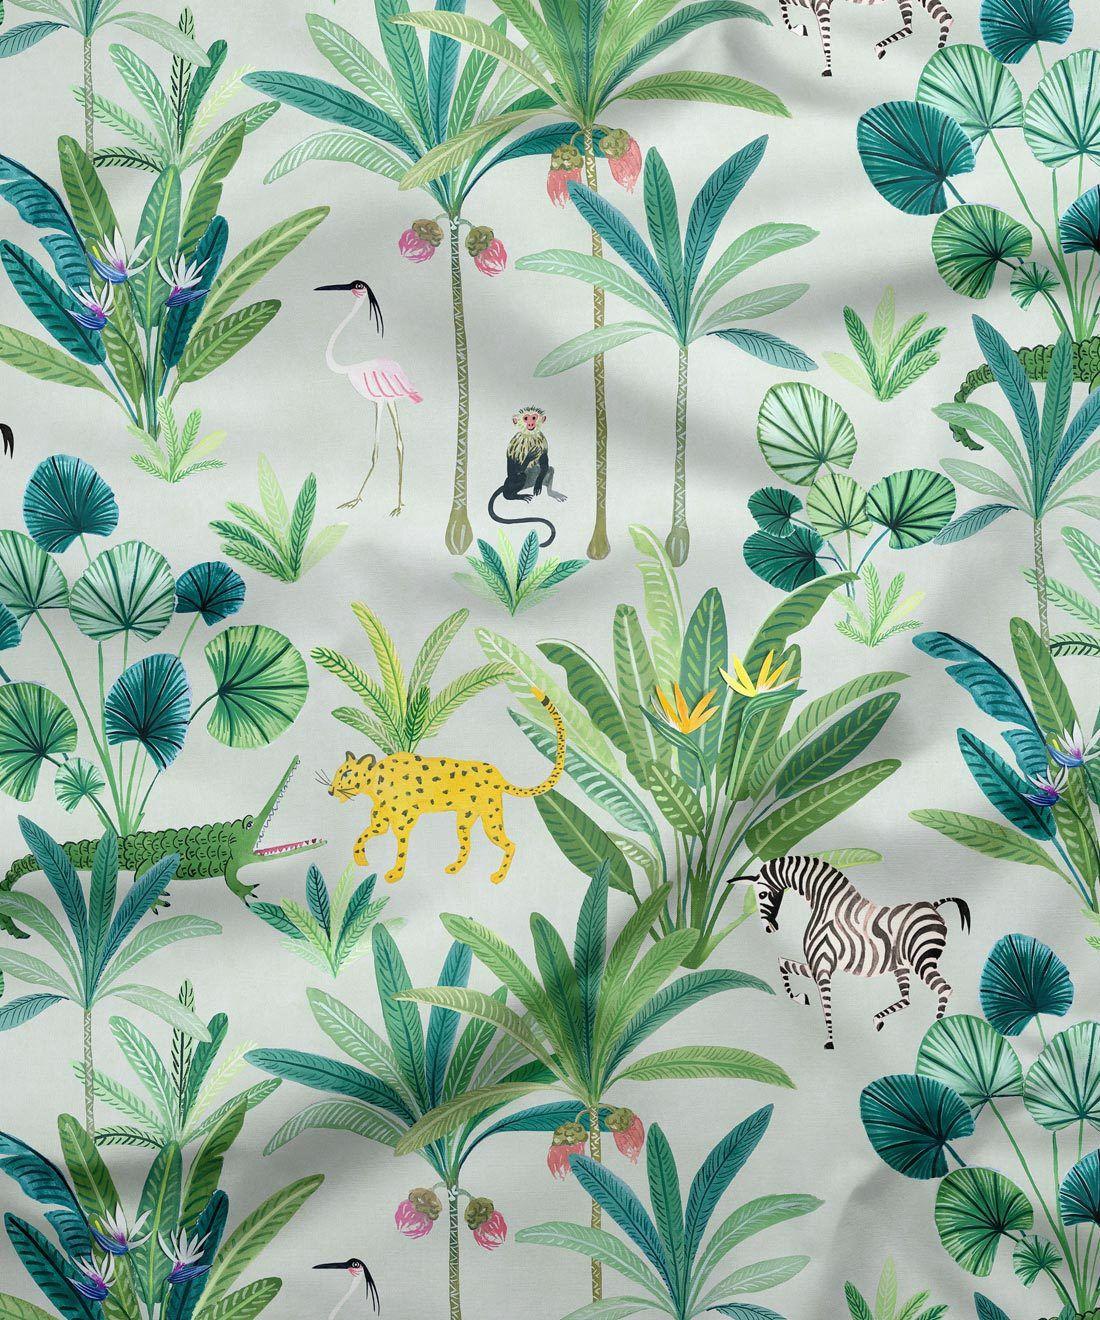 Animal Kingdom Fabric Cream